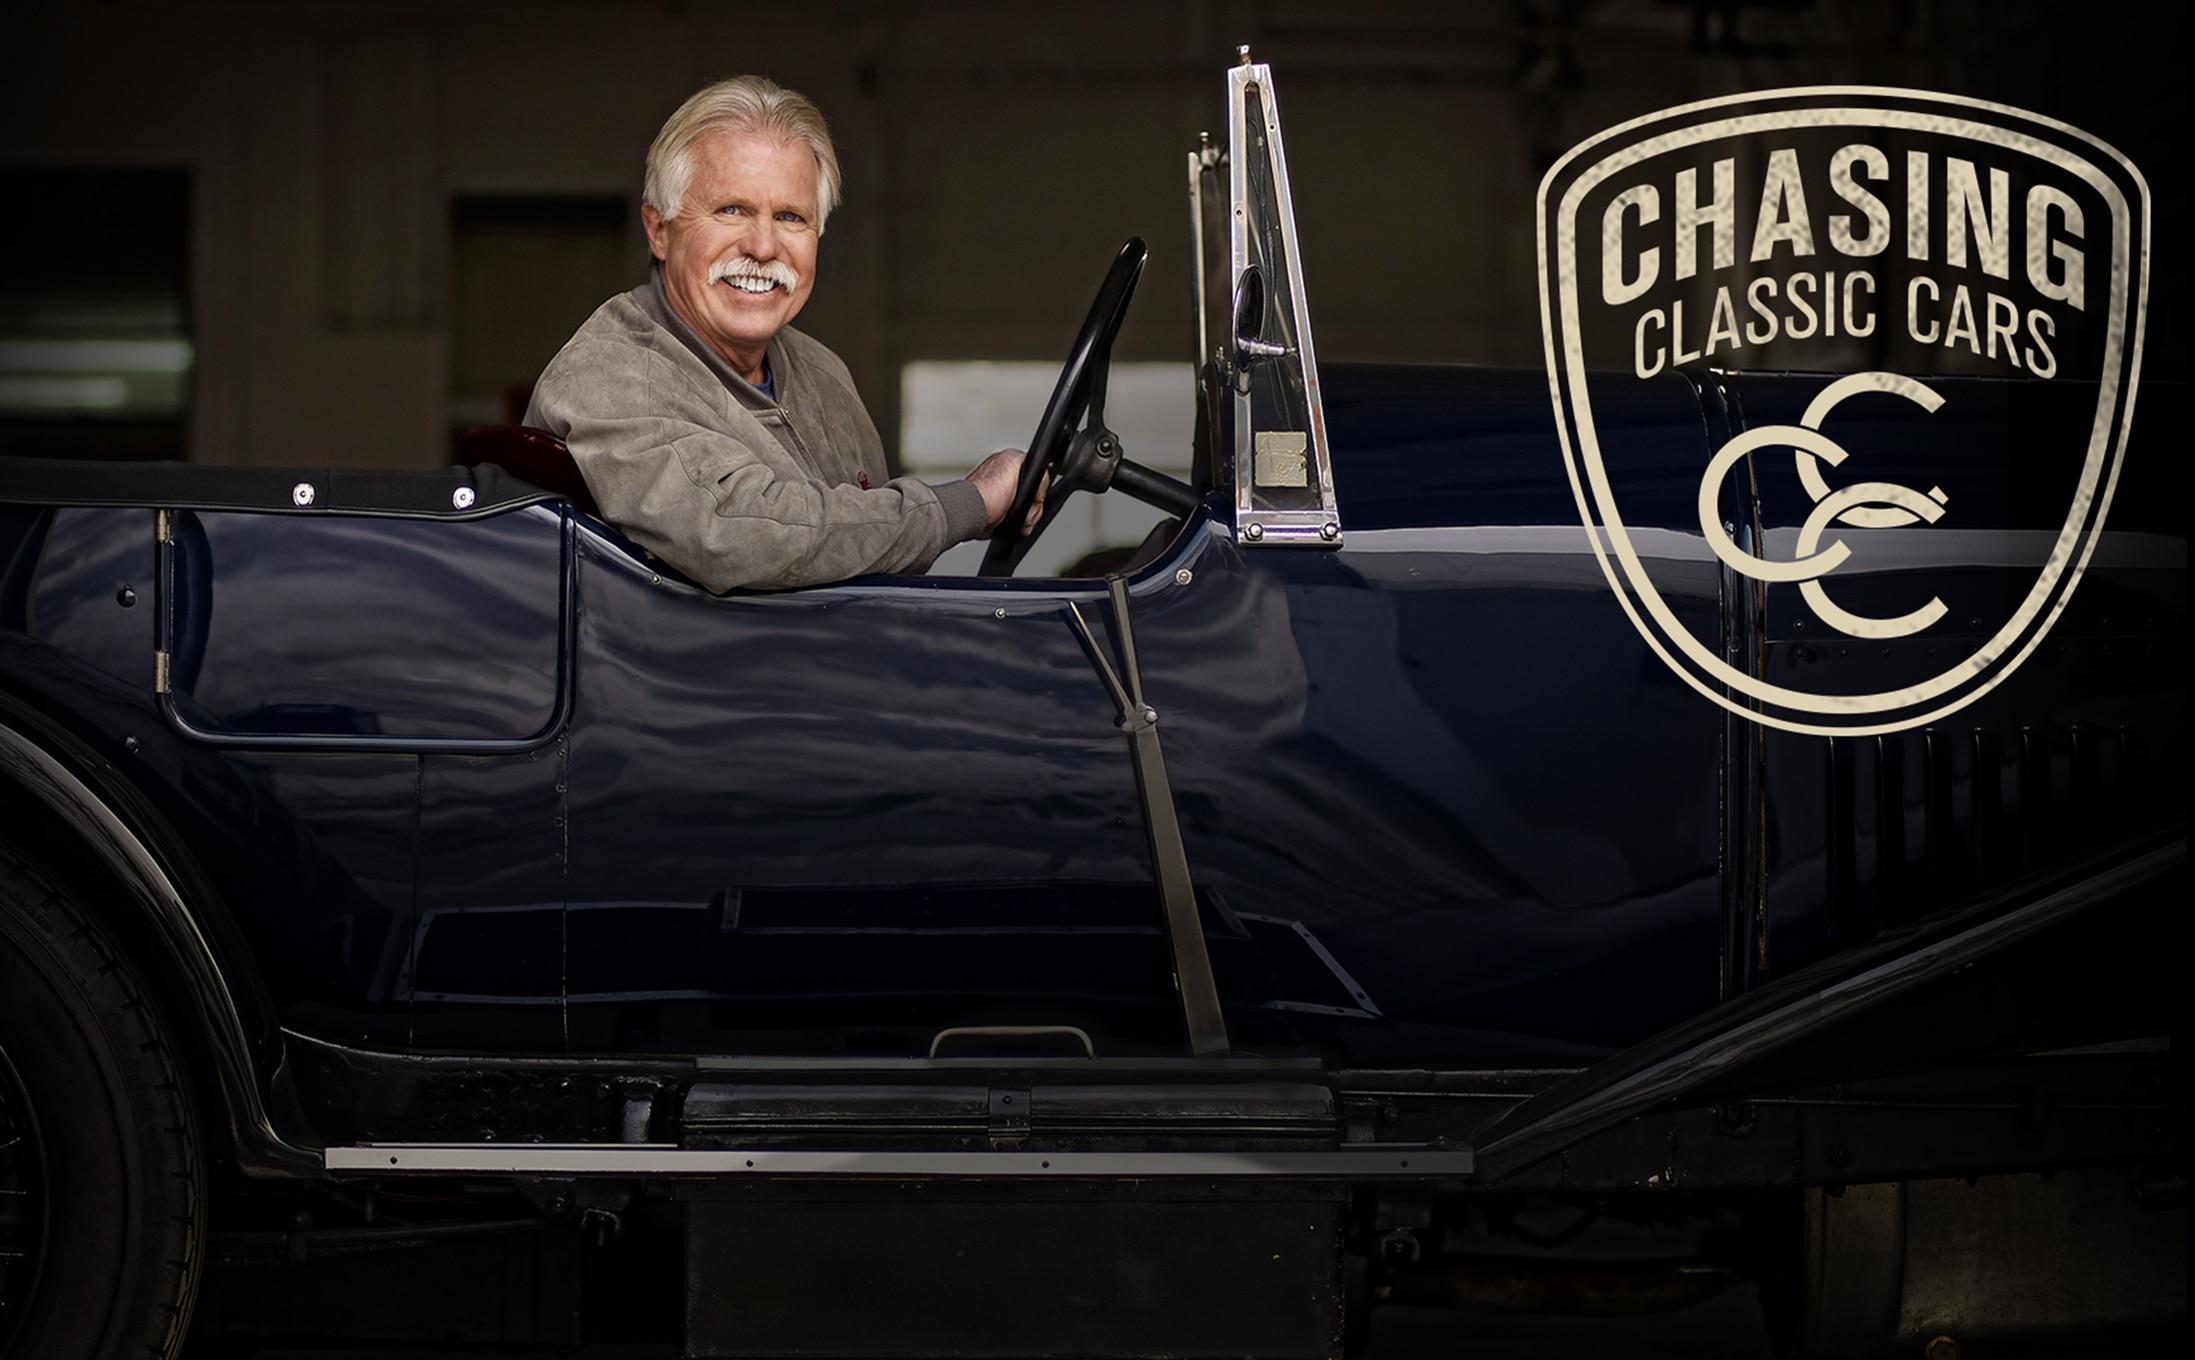 Chasing Classic Cars MTOD